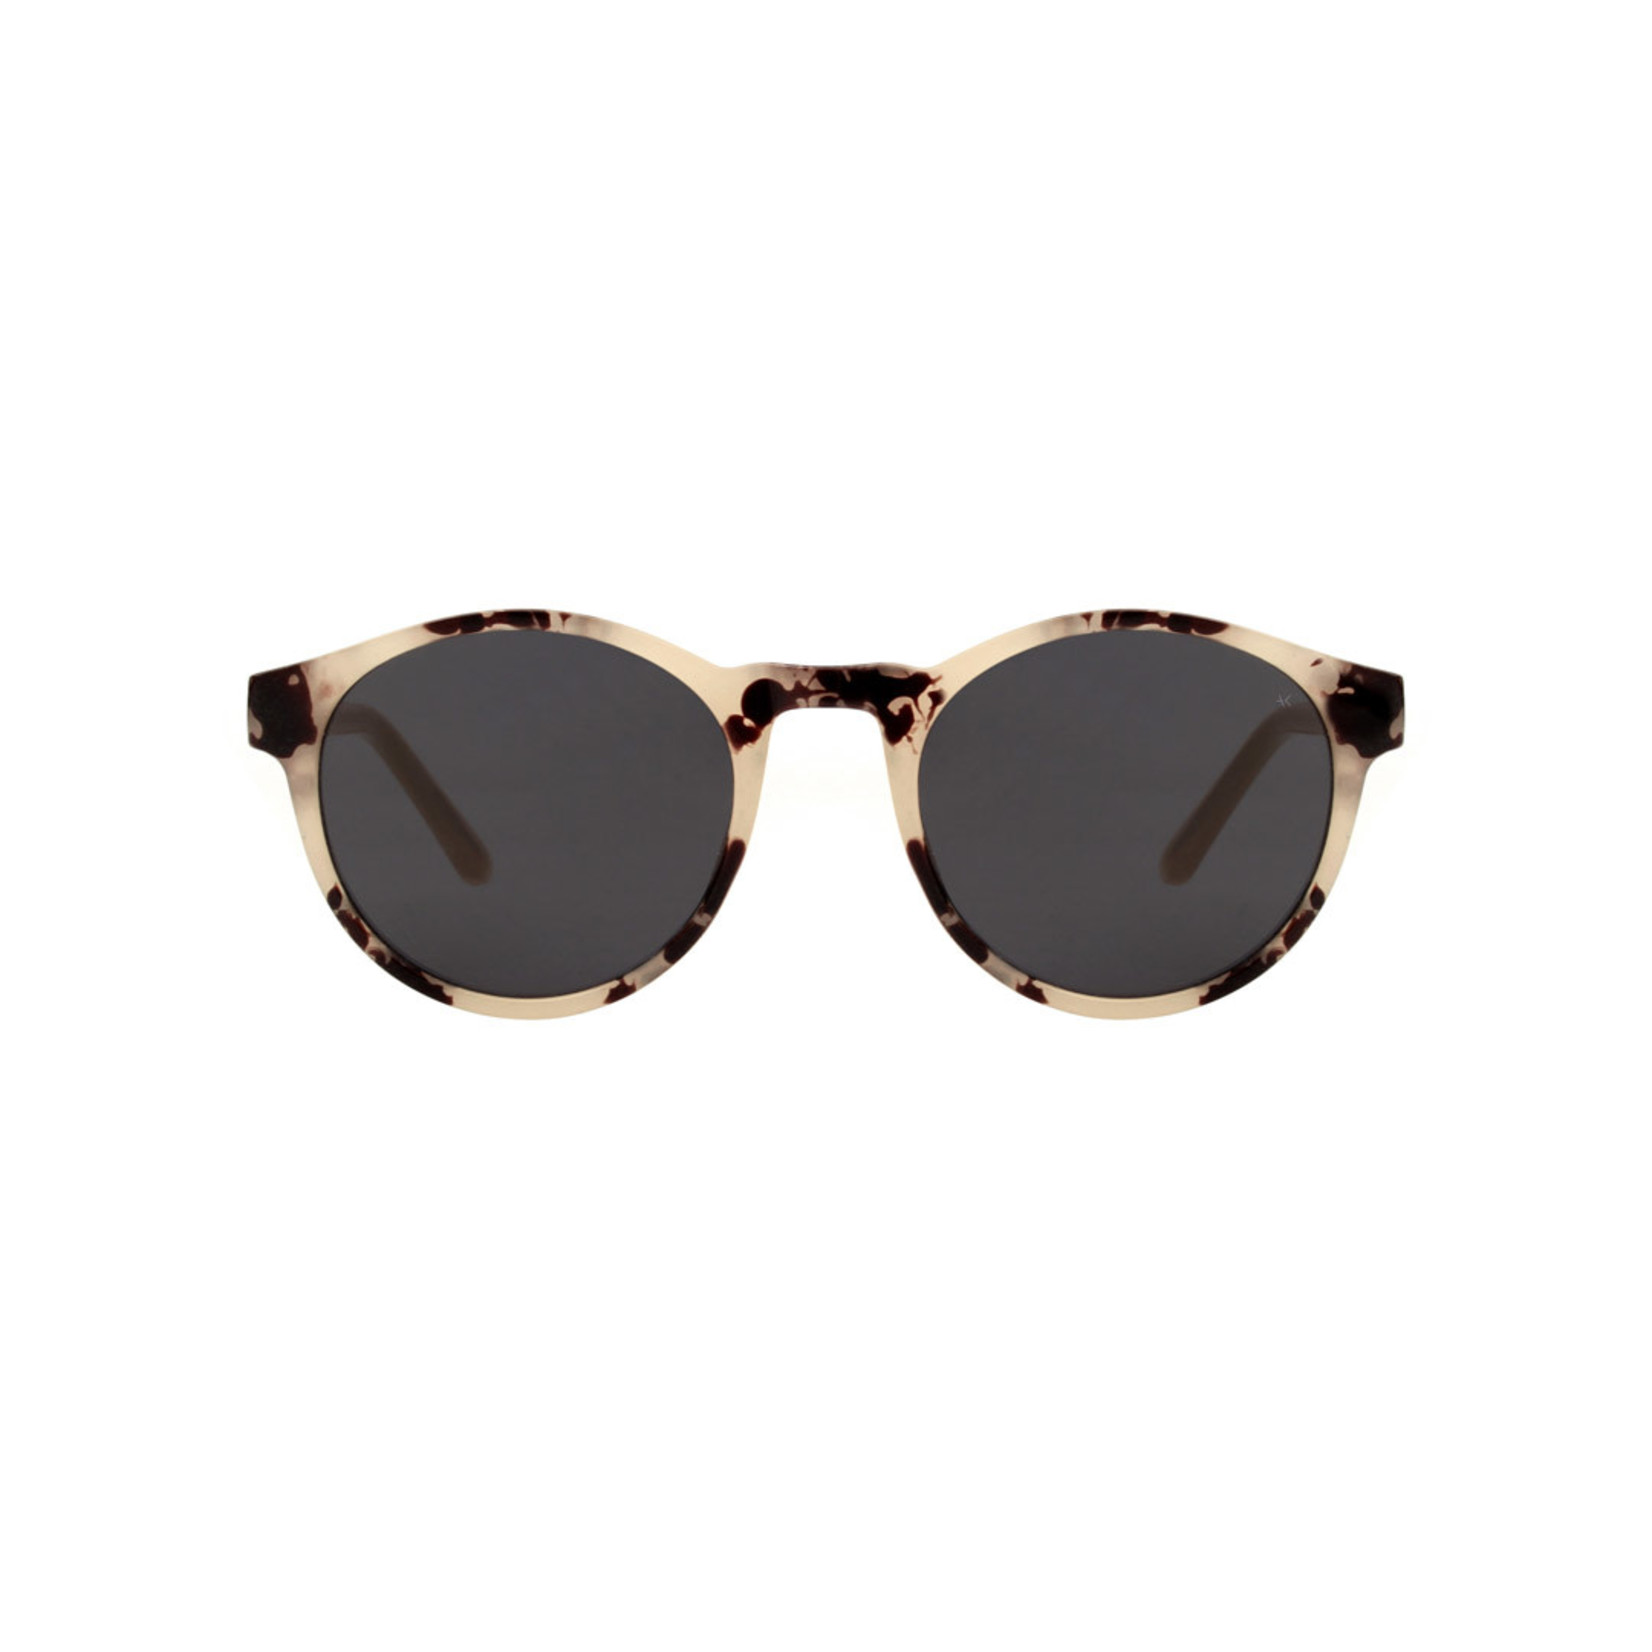 Kjearbede Kjearbede zonnebril Marvin Hornet / KL1708-12